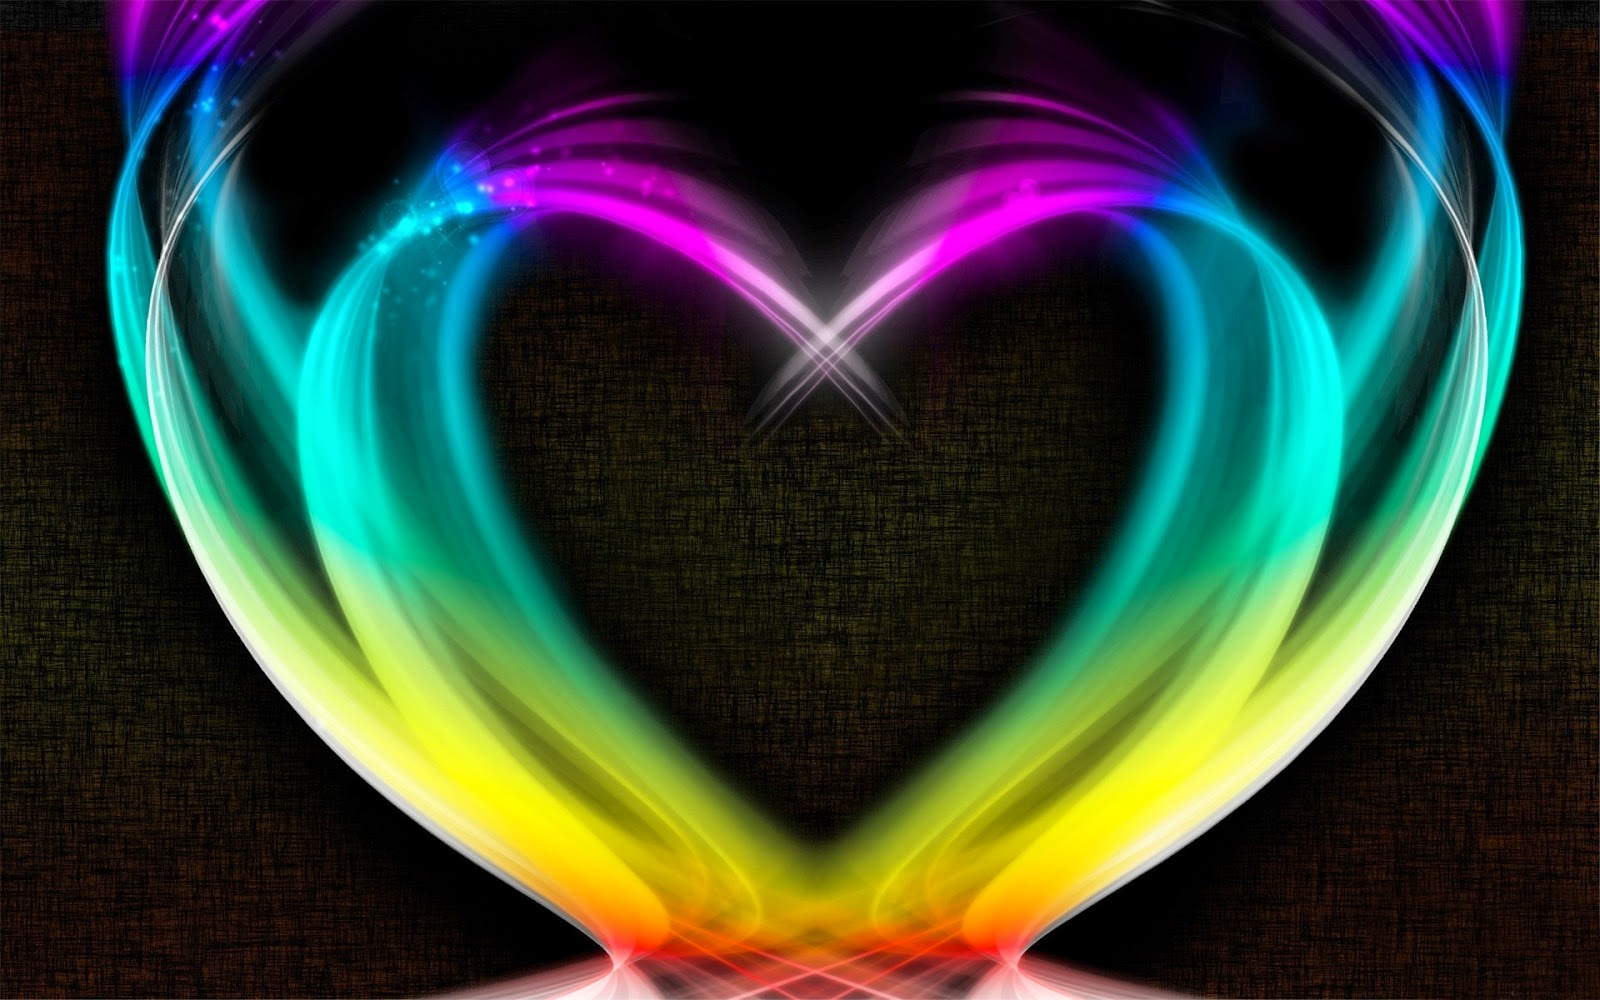 Rainbow Love wallpapers HD